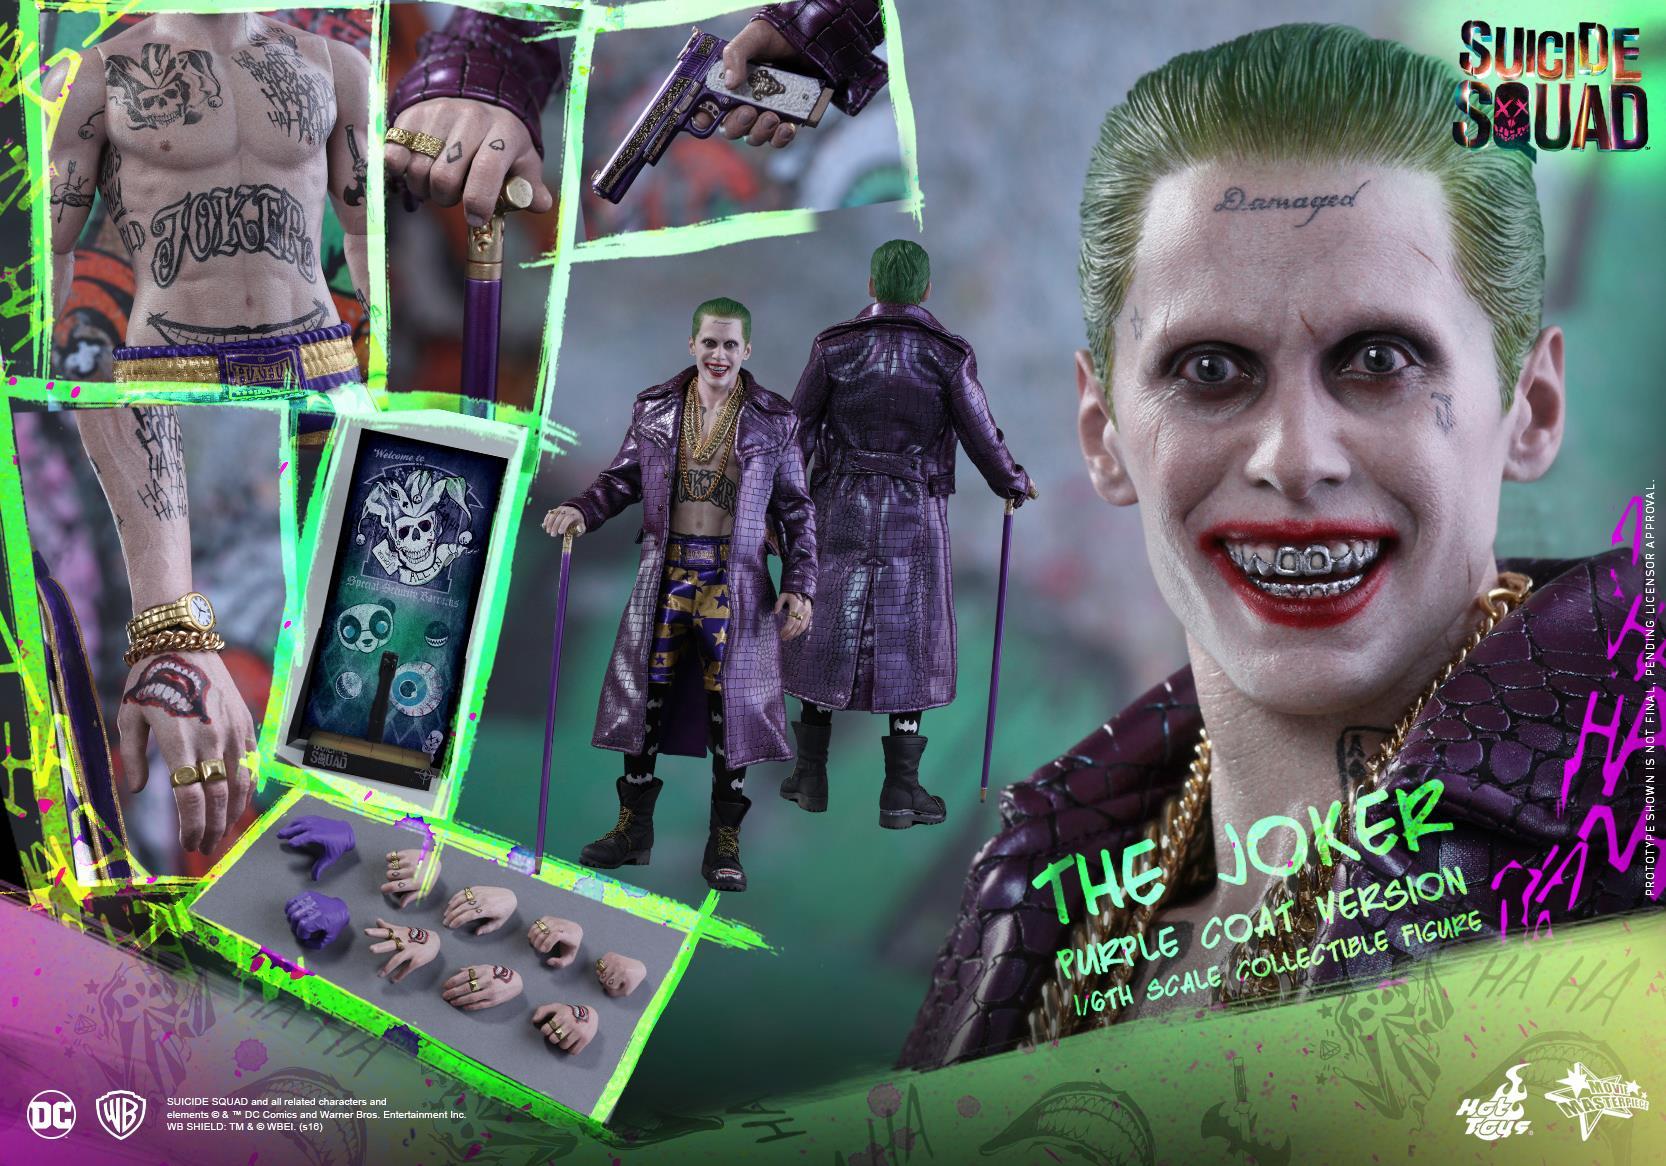 Hot-Toys-Suicide-Squad-Joker-Purple-Coat-18